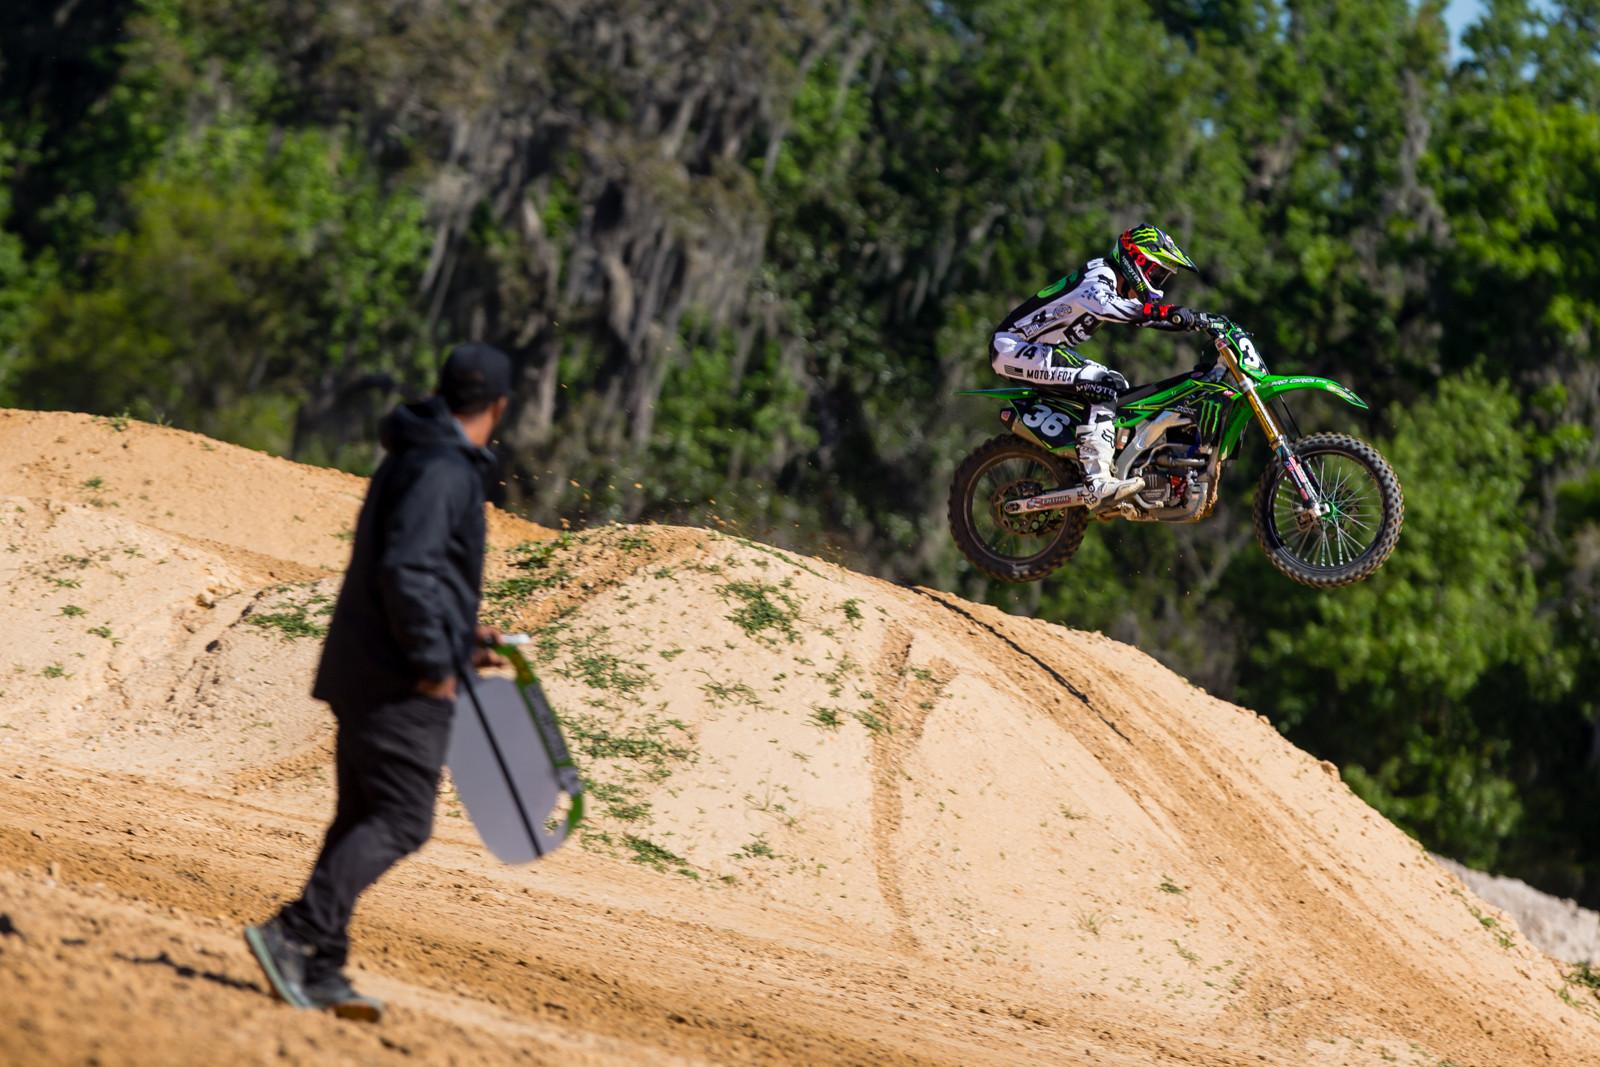 Adam Cianciarulo - Photo Gallery: The Nest, Goat Farm, and MTF - Motocross Pictures - Vital MX